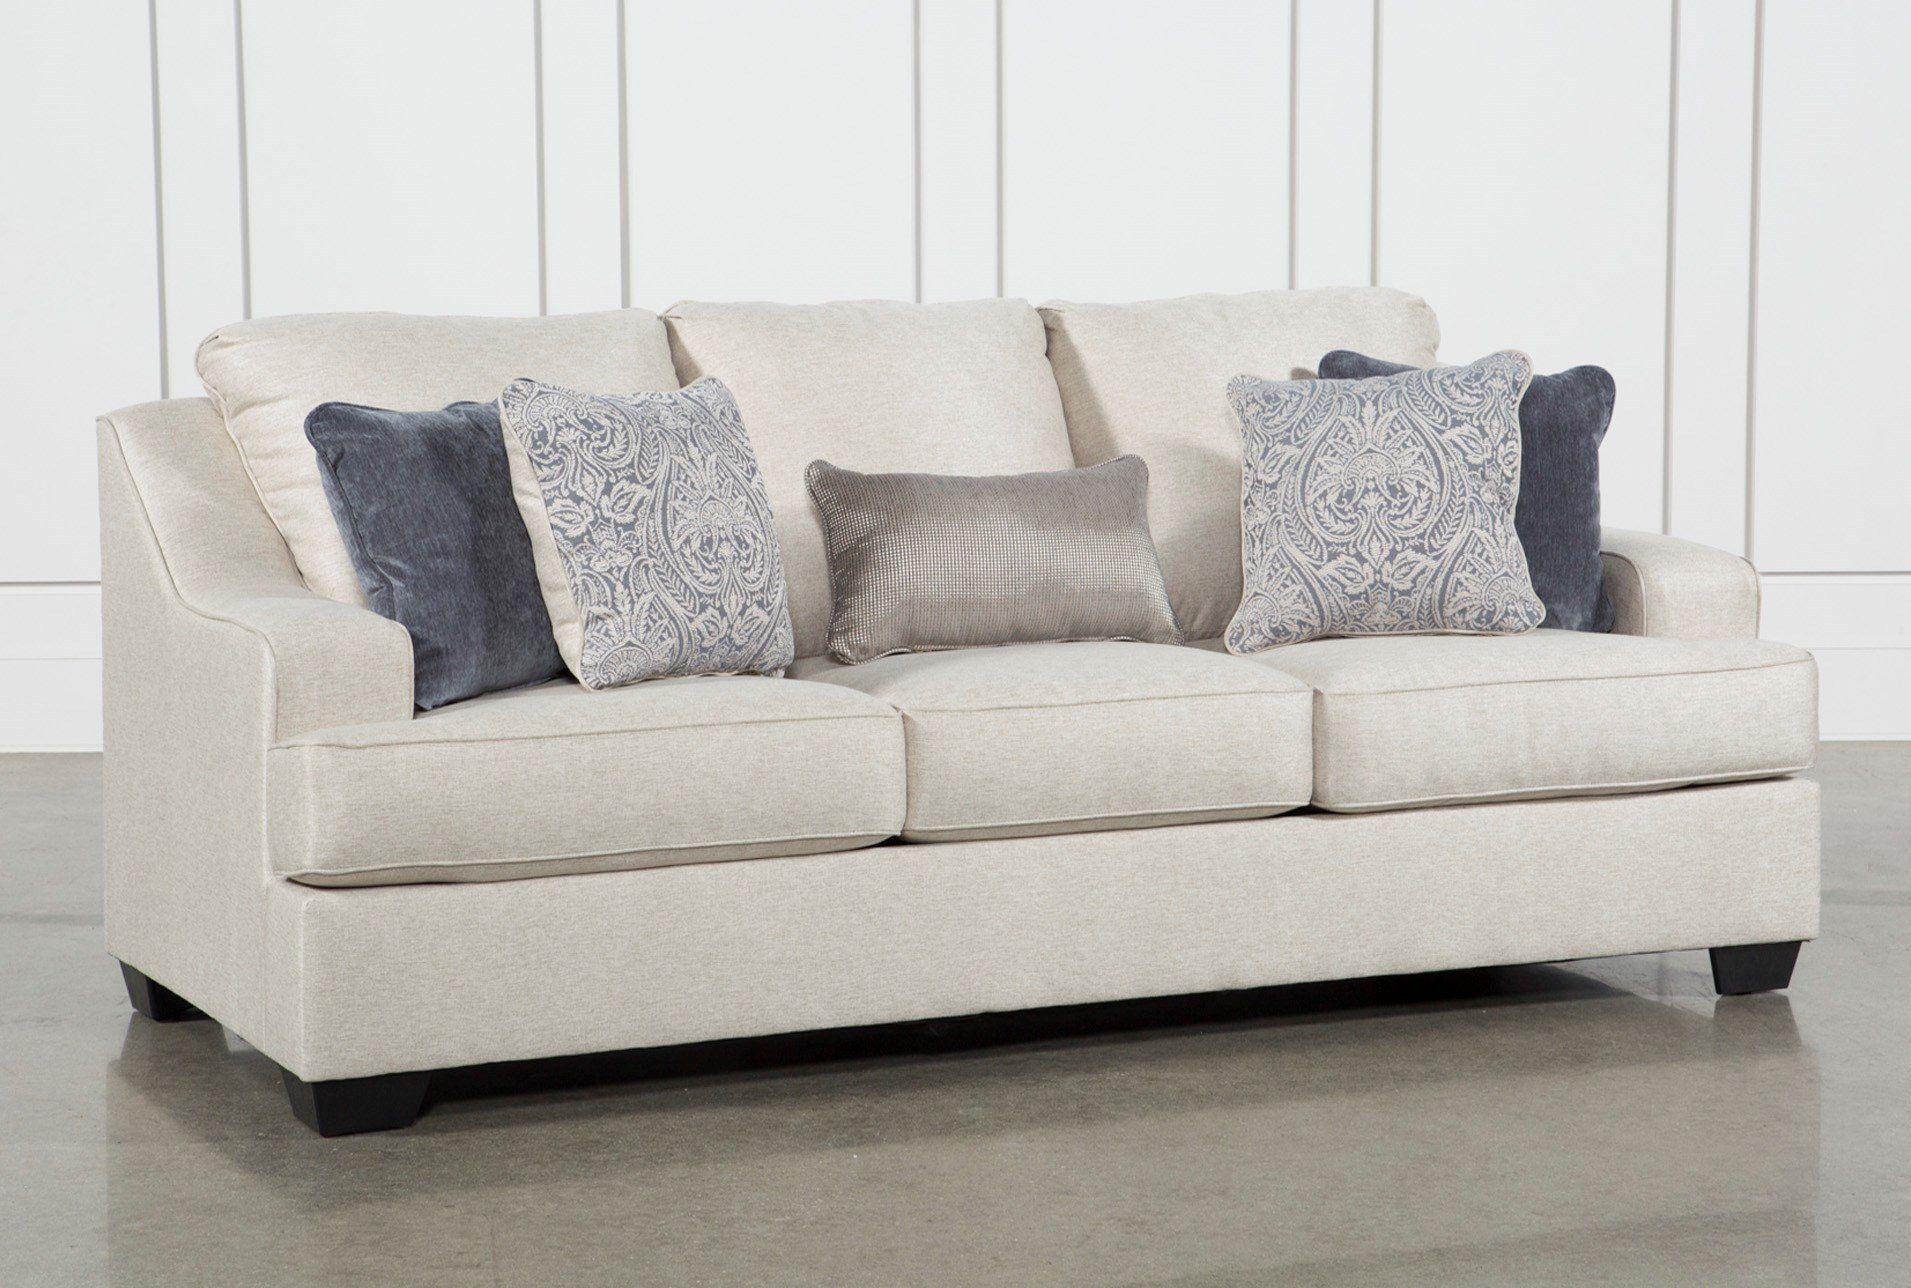 Brumbeck Sofa Queen Sofa Sleeper Comfortable Sofa Bed Small Sofa Bed